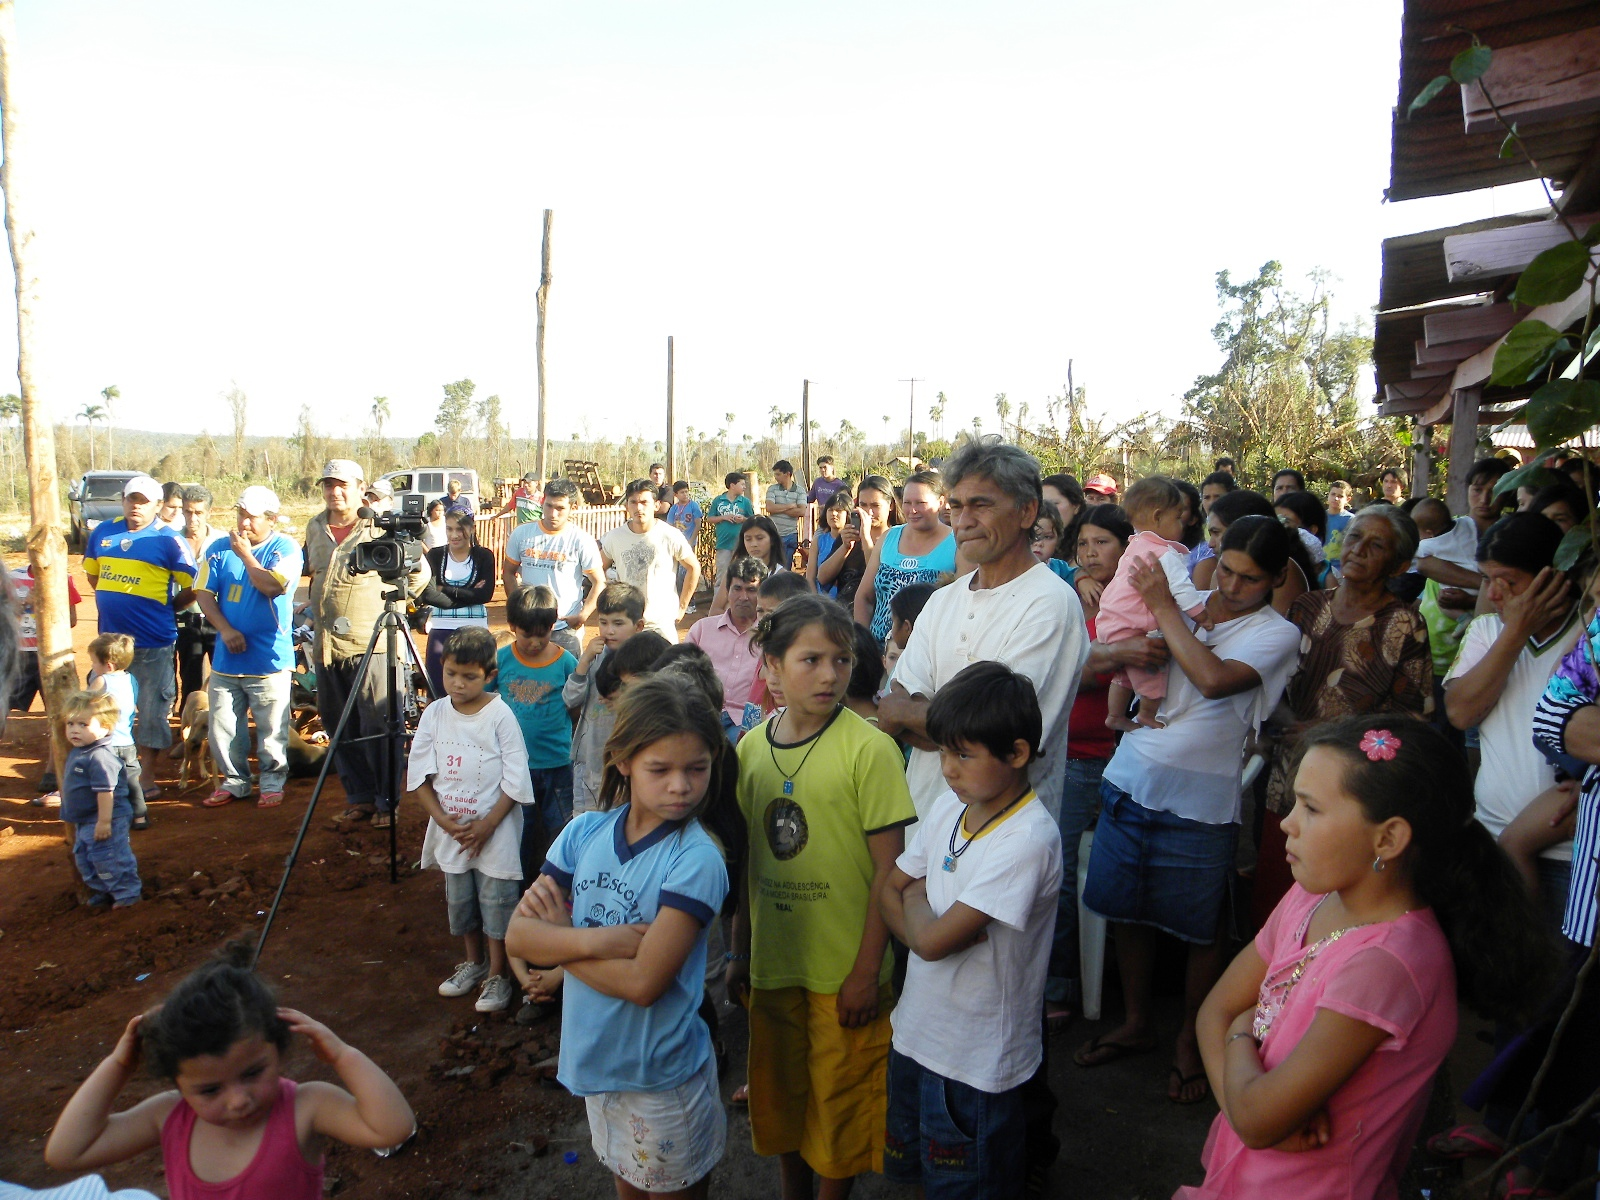 Gobernacion de canindeyu inauguraci n oficial del for Tambores para agua potable